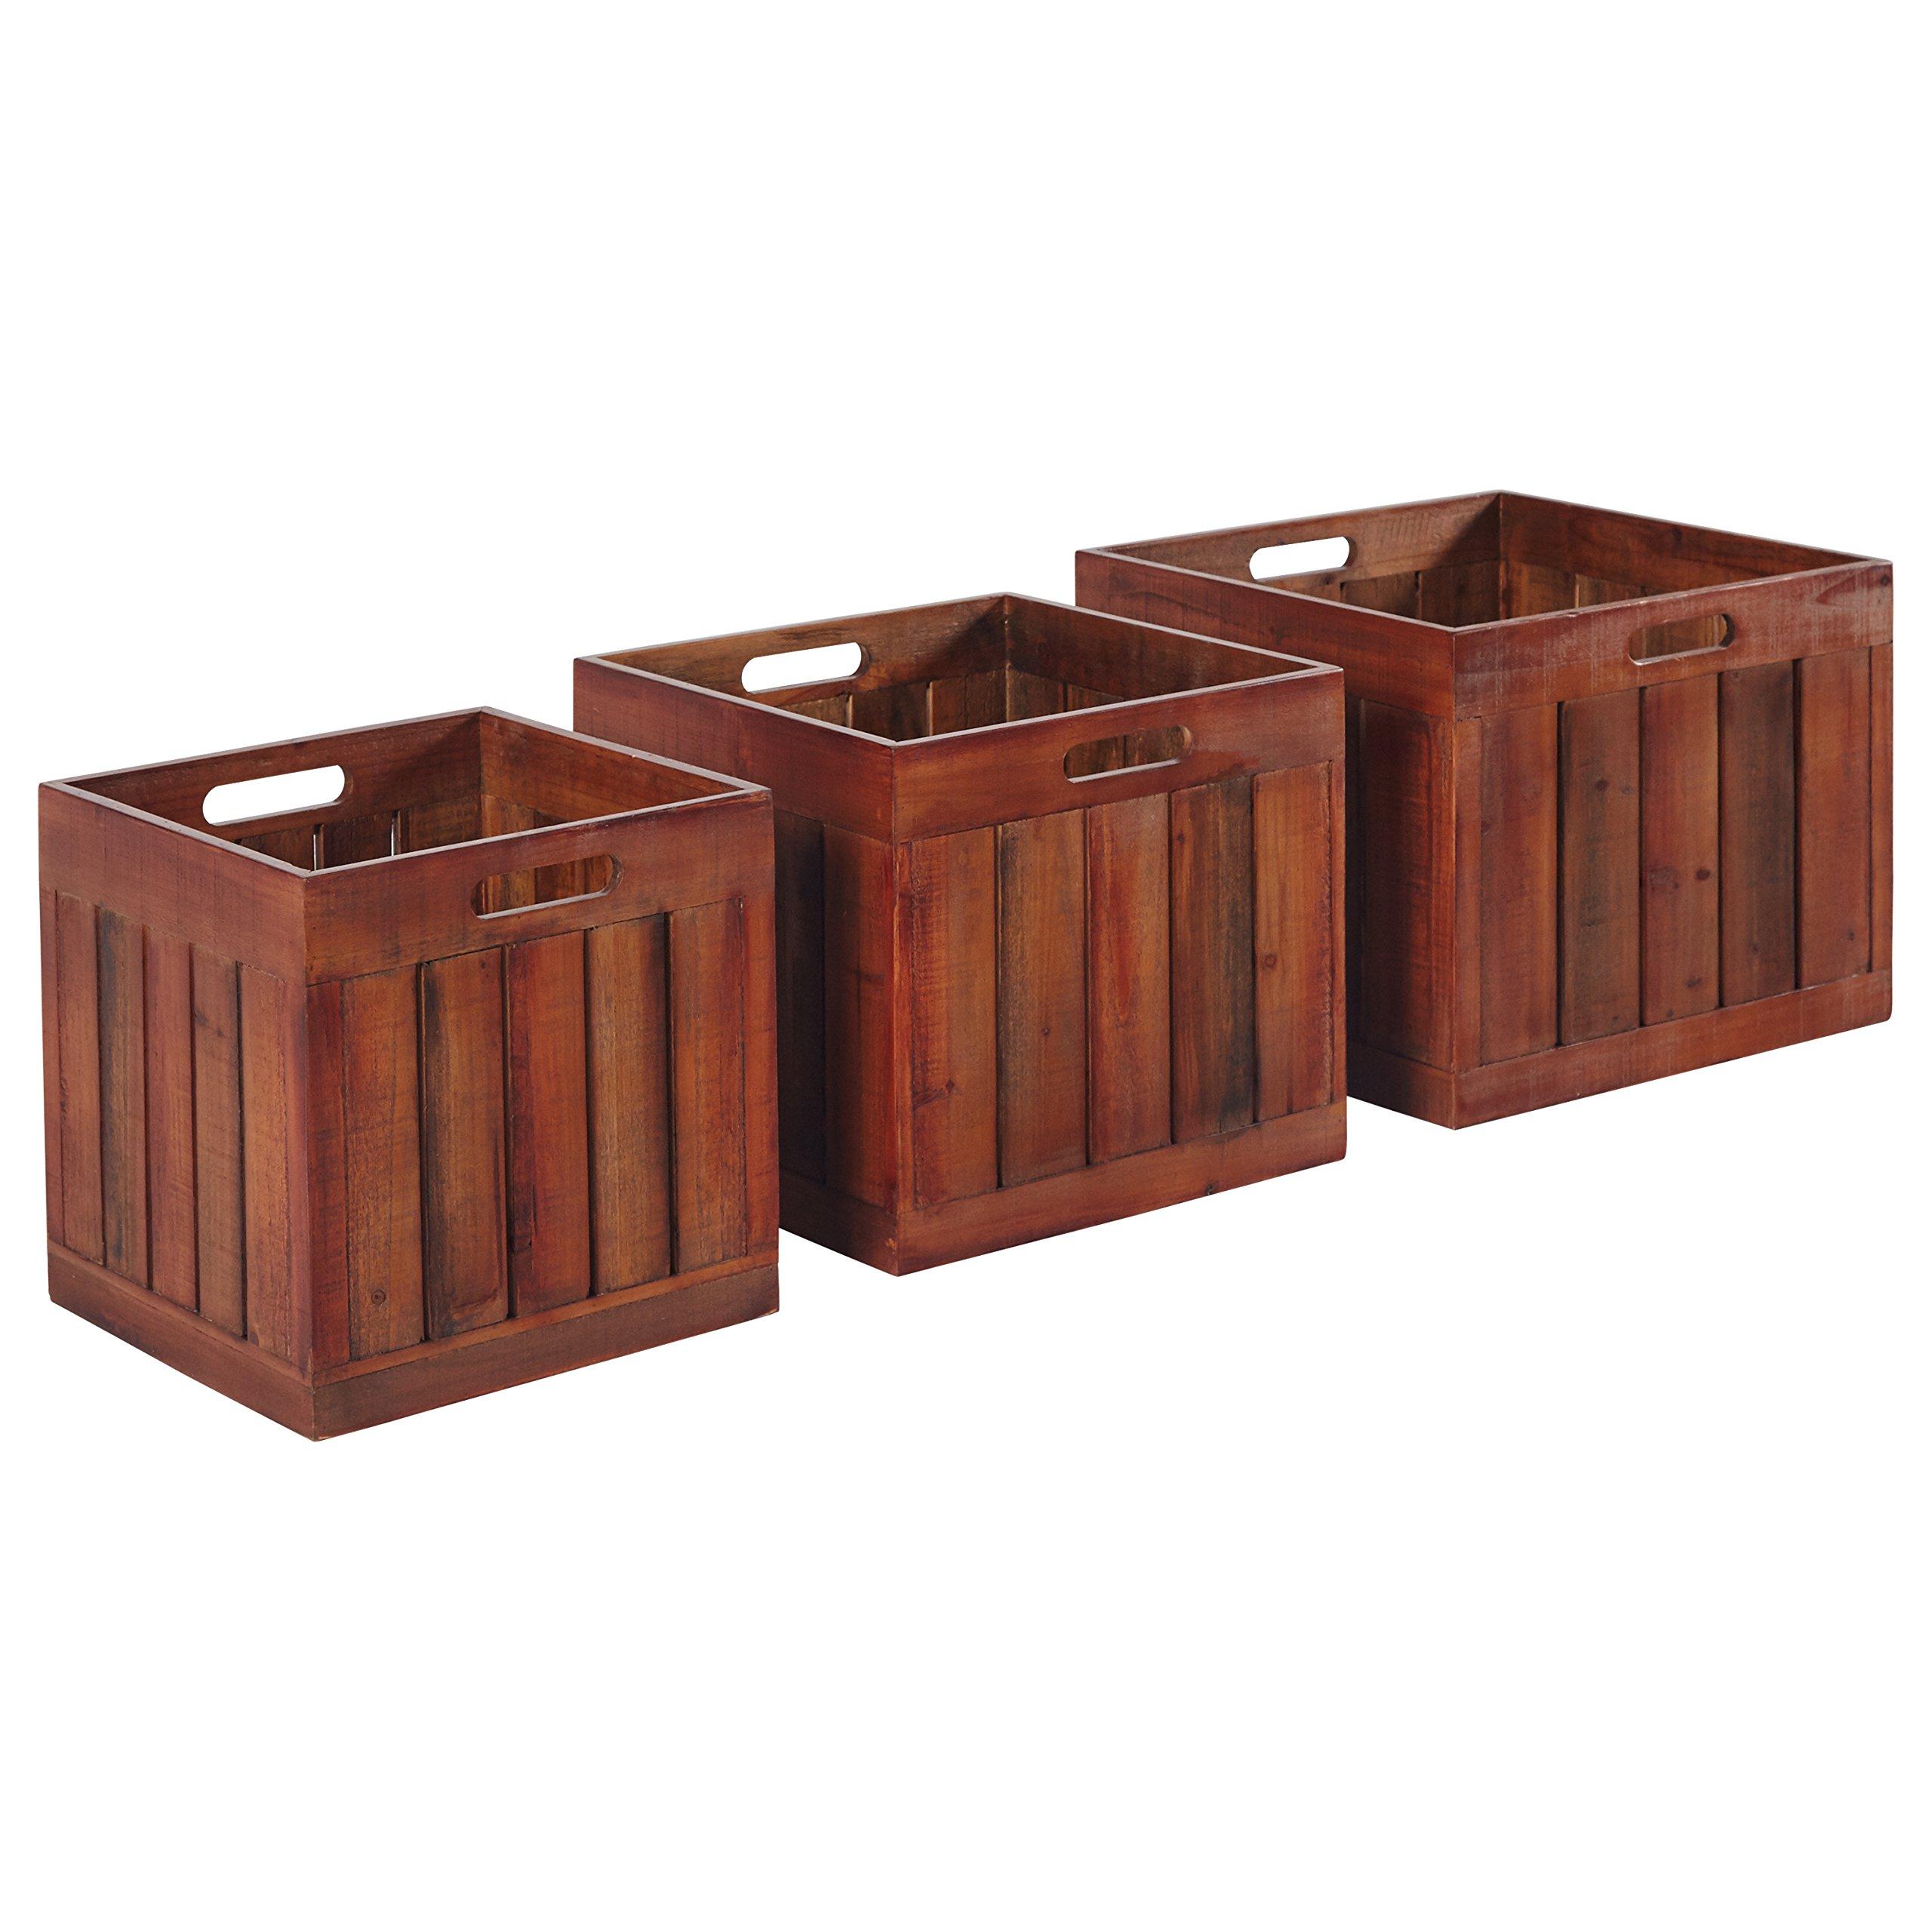 Amazon Brand – Stone & Beam Modern Rustic Farmhouse Wood Slat Storage Bins - Set of 3, Natural